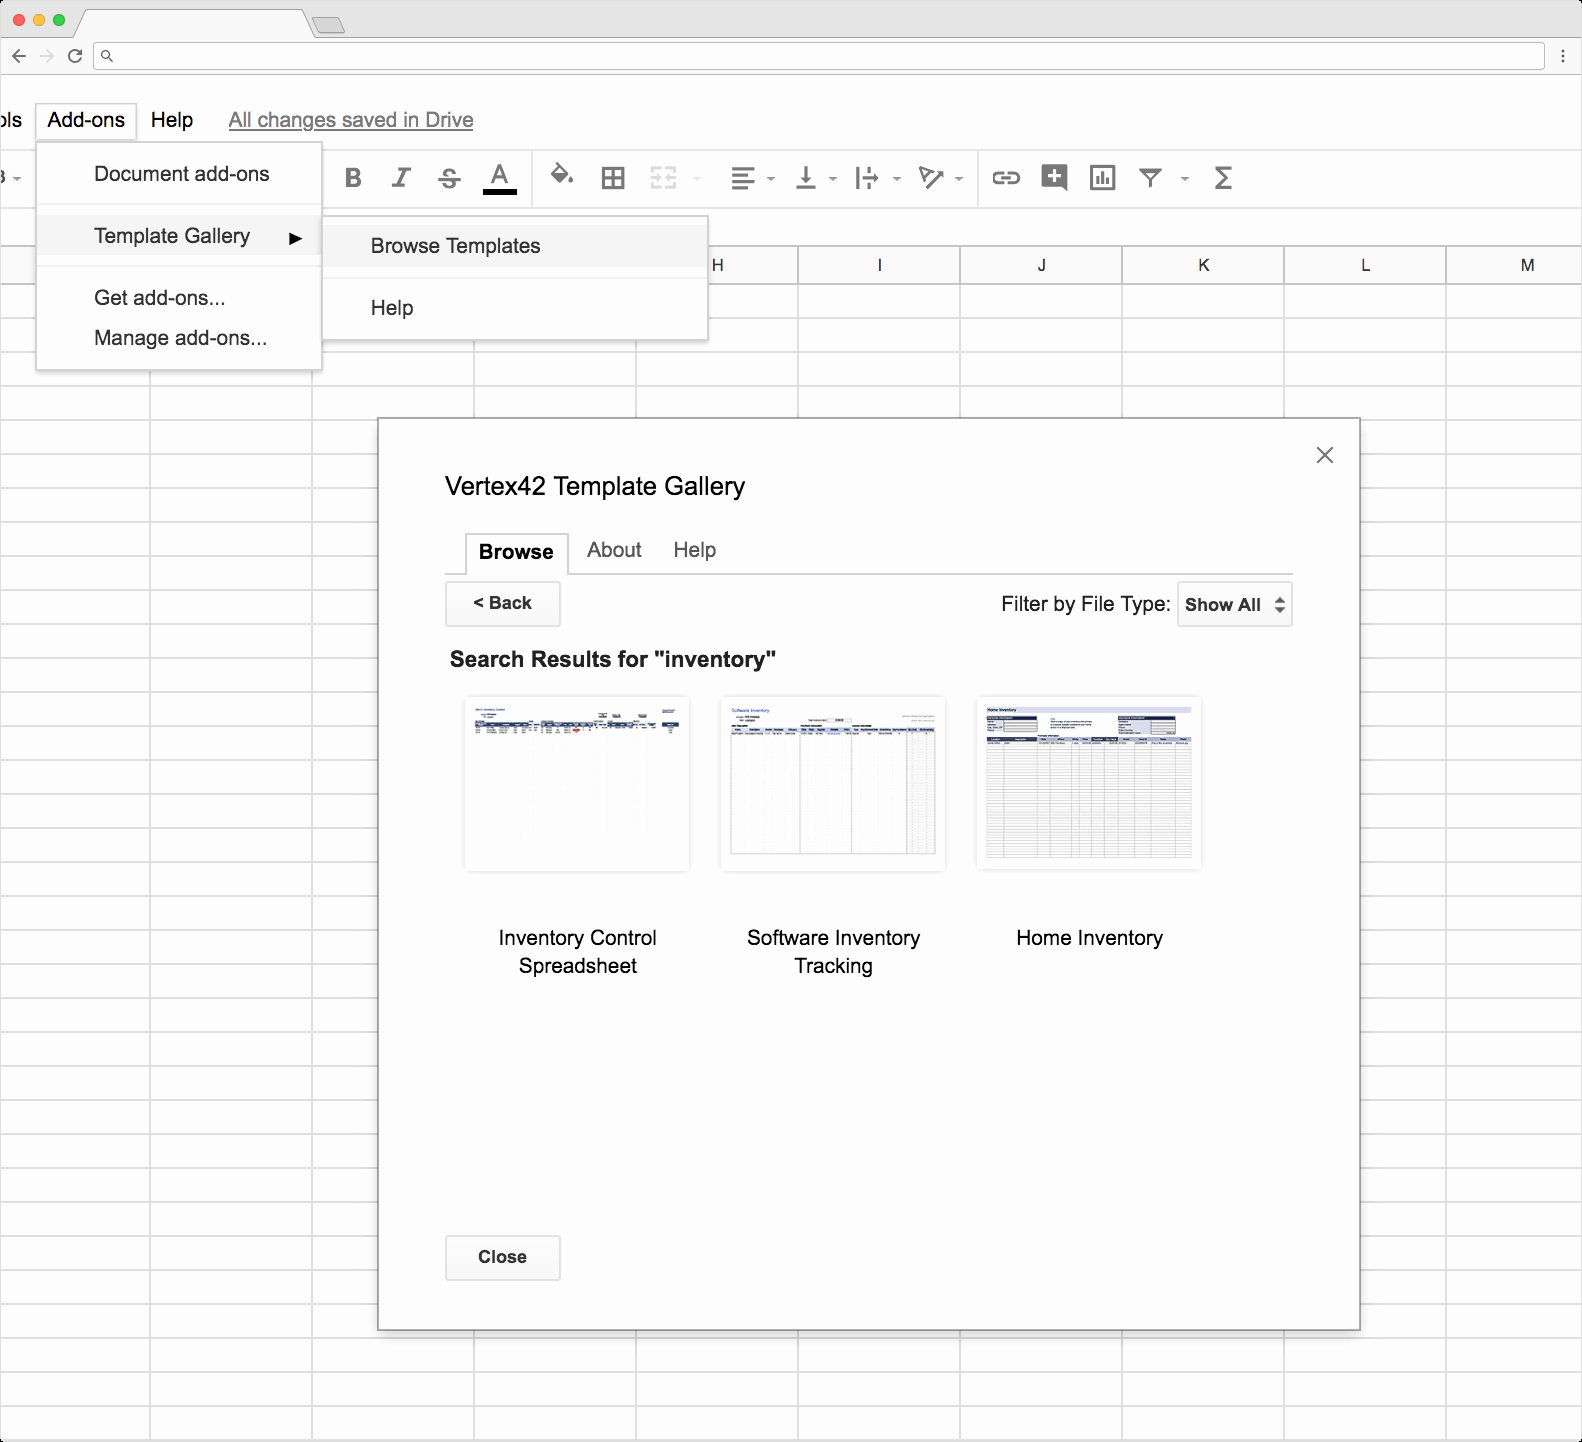 Free Google Sheets Templates New top 5 Free Google Sheets Inventory Templates Blog Sheetgo